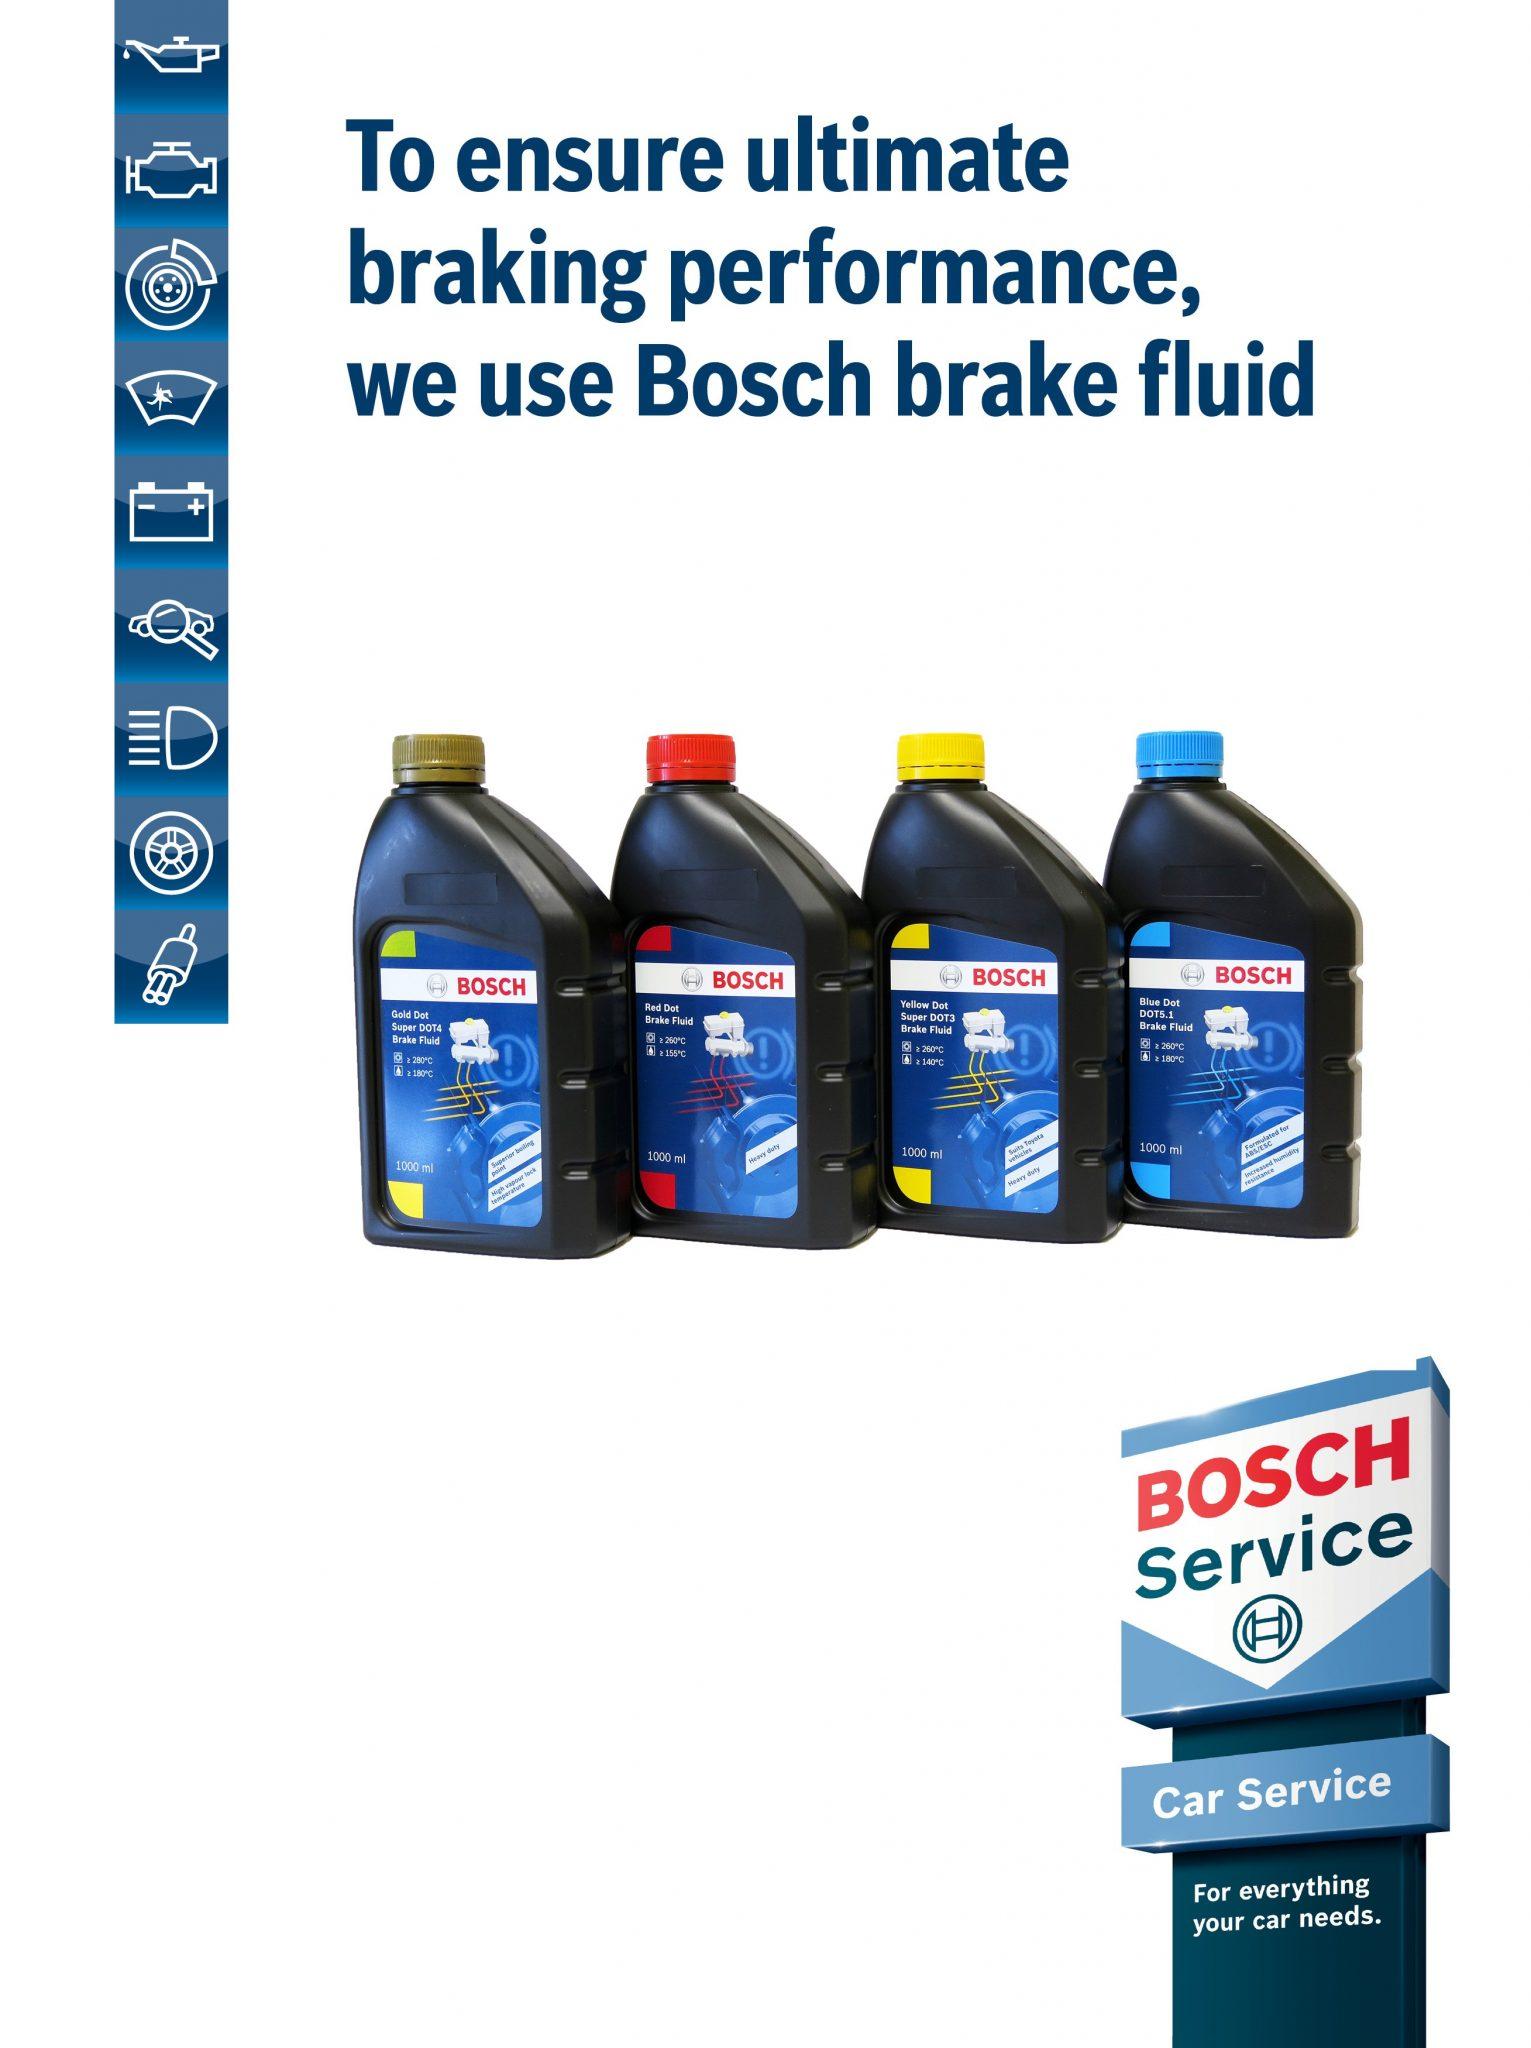 bosch-brake-fluid